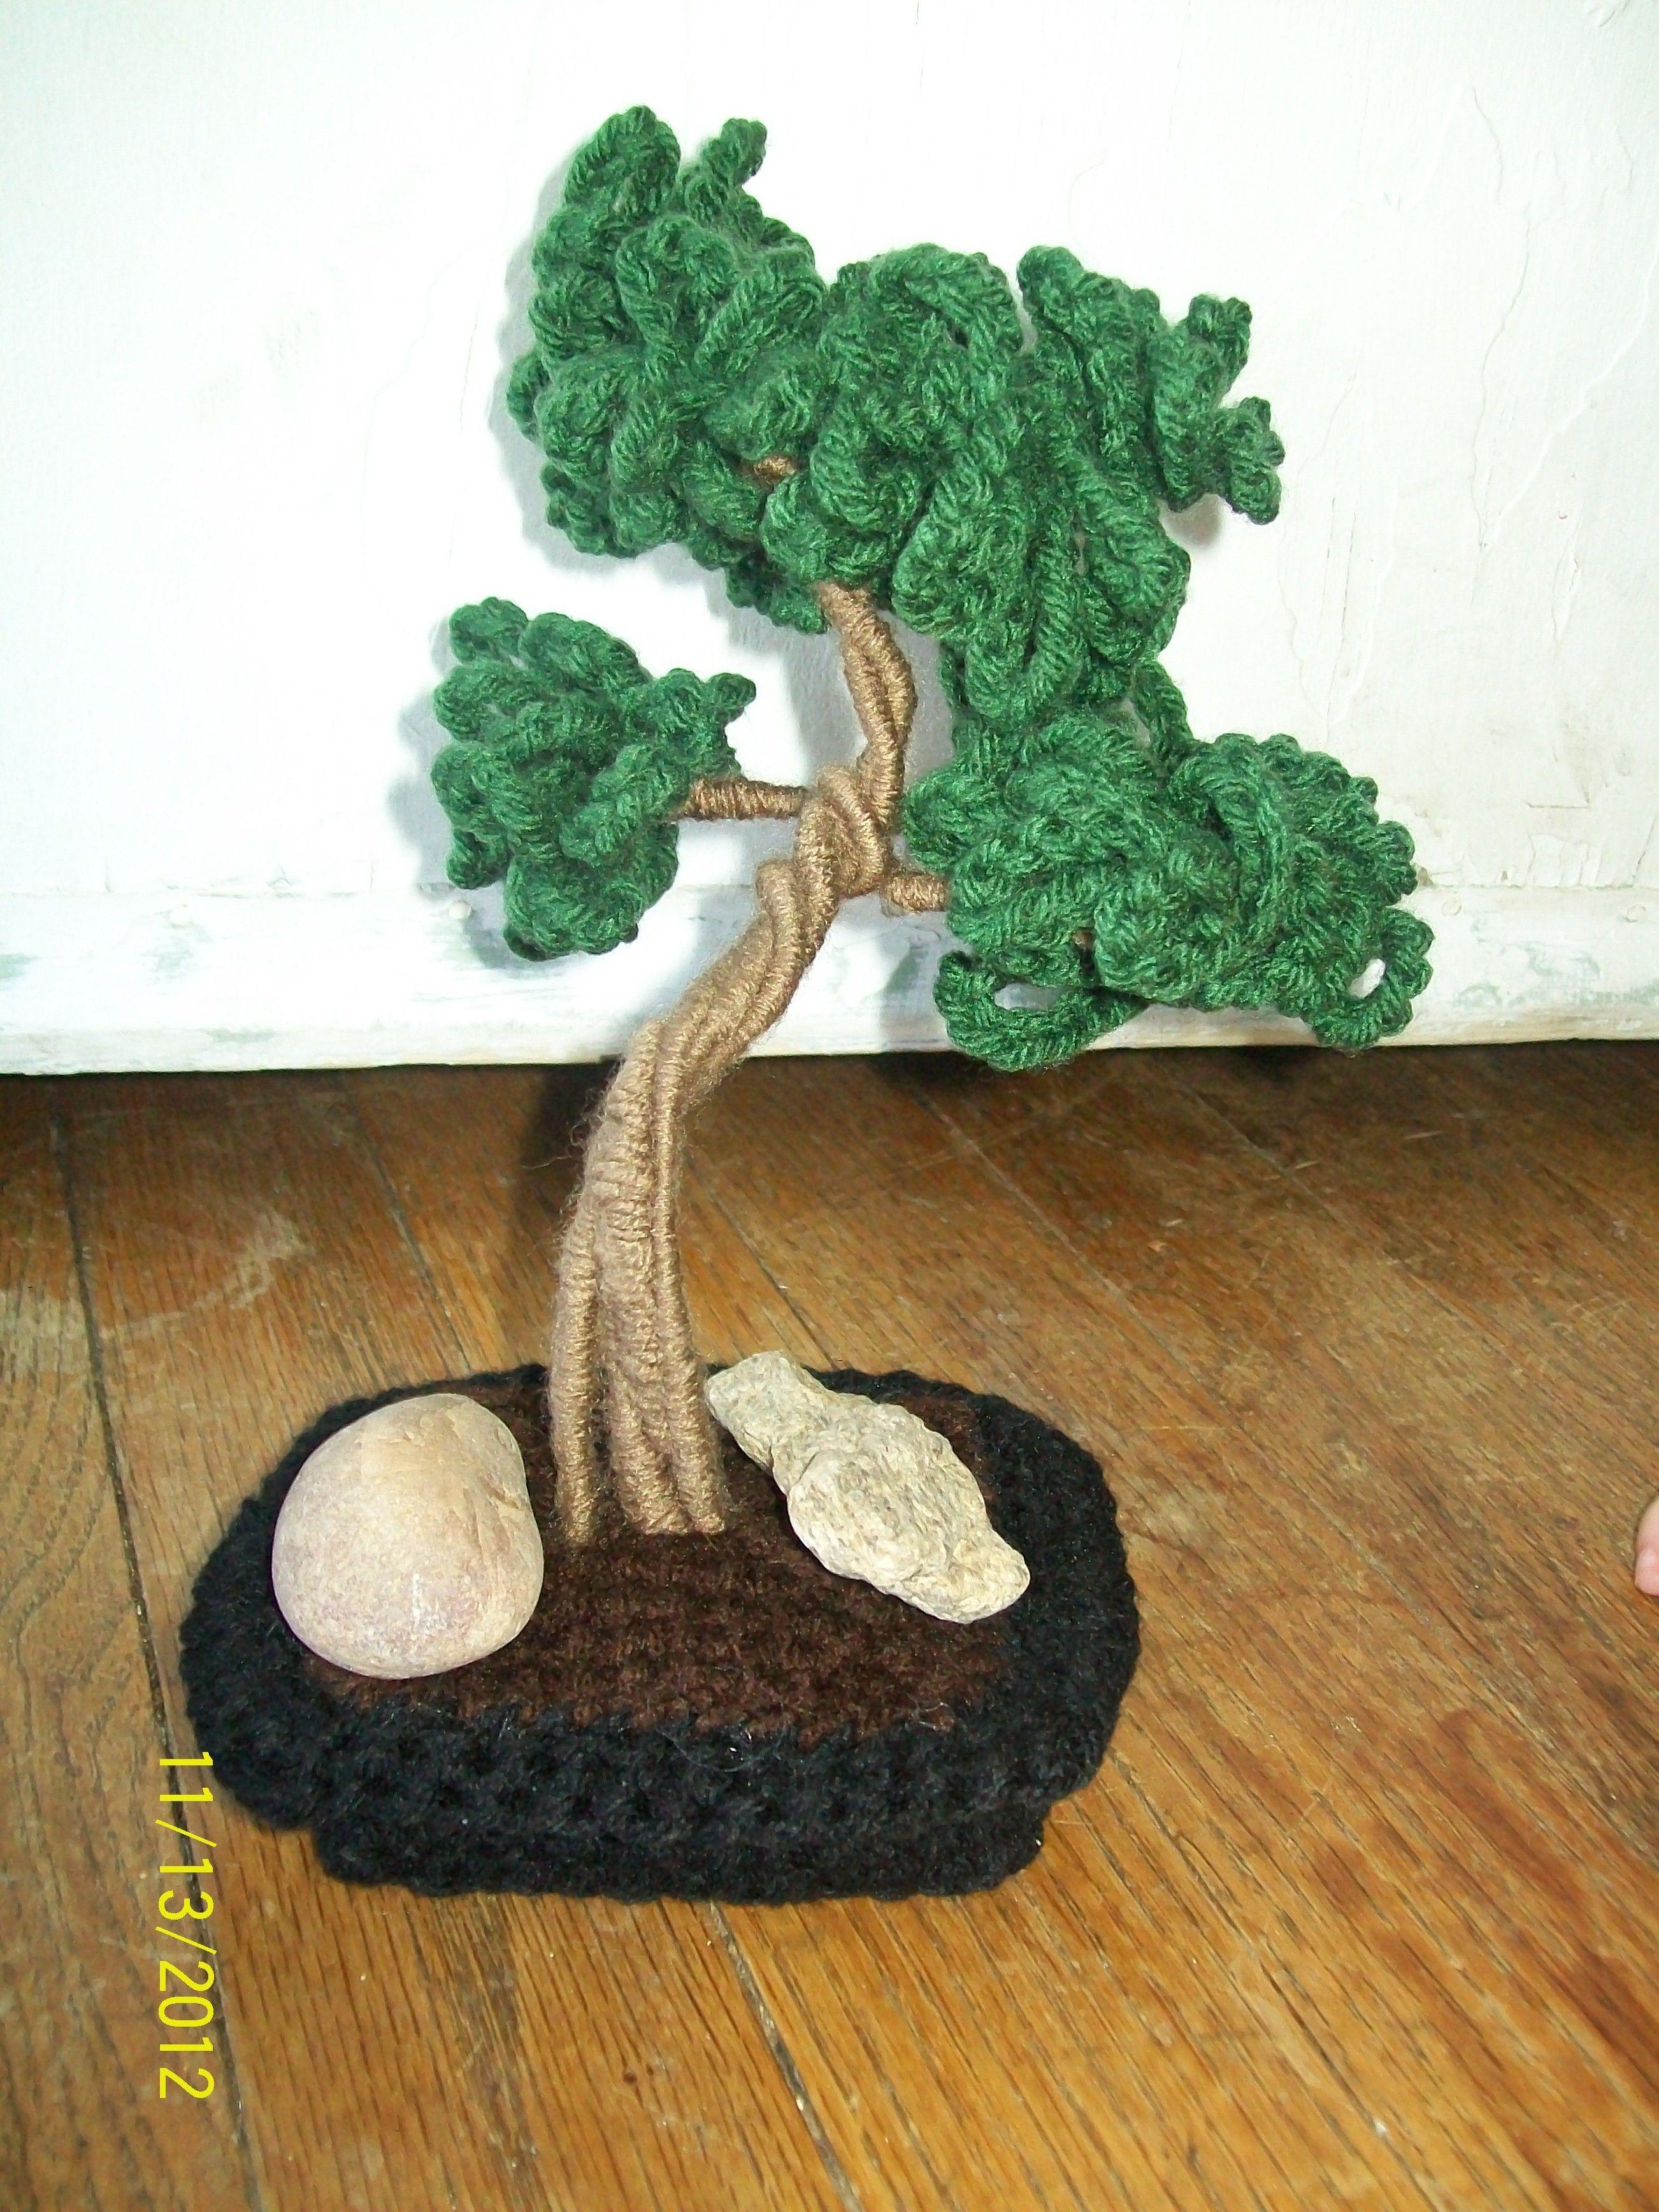 Bonsai Tree | Bonsai | Pinterest | Blumen häkeln, Baum und Amigurumi